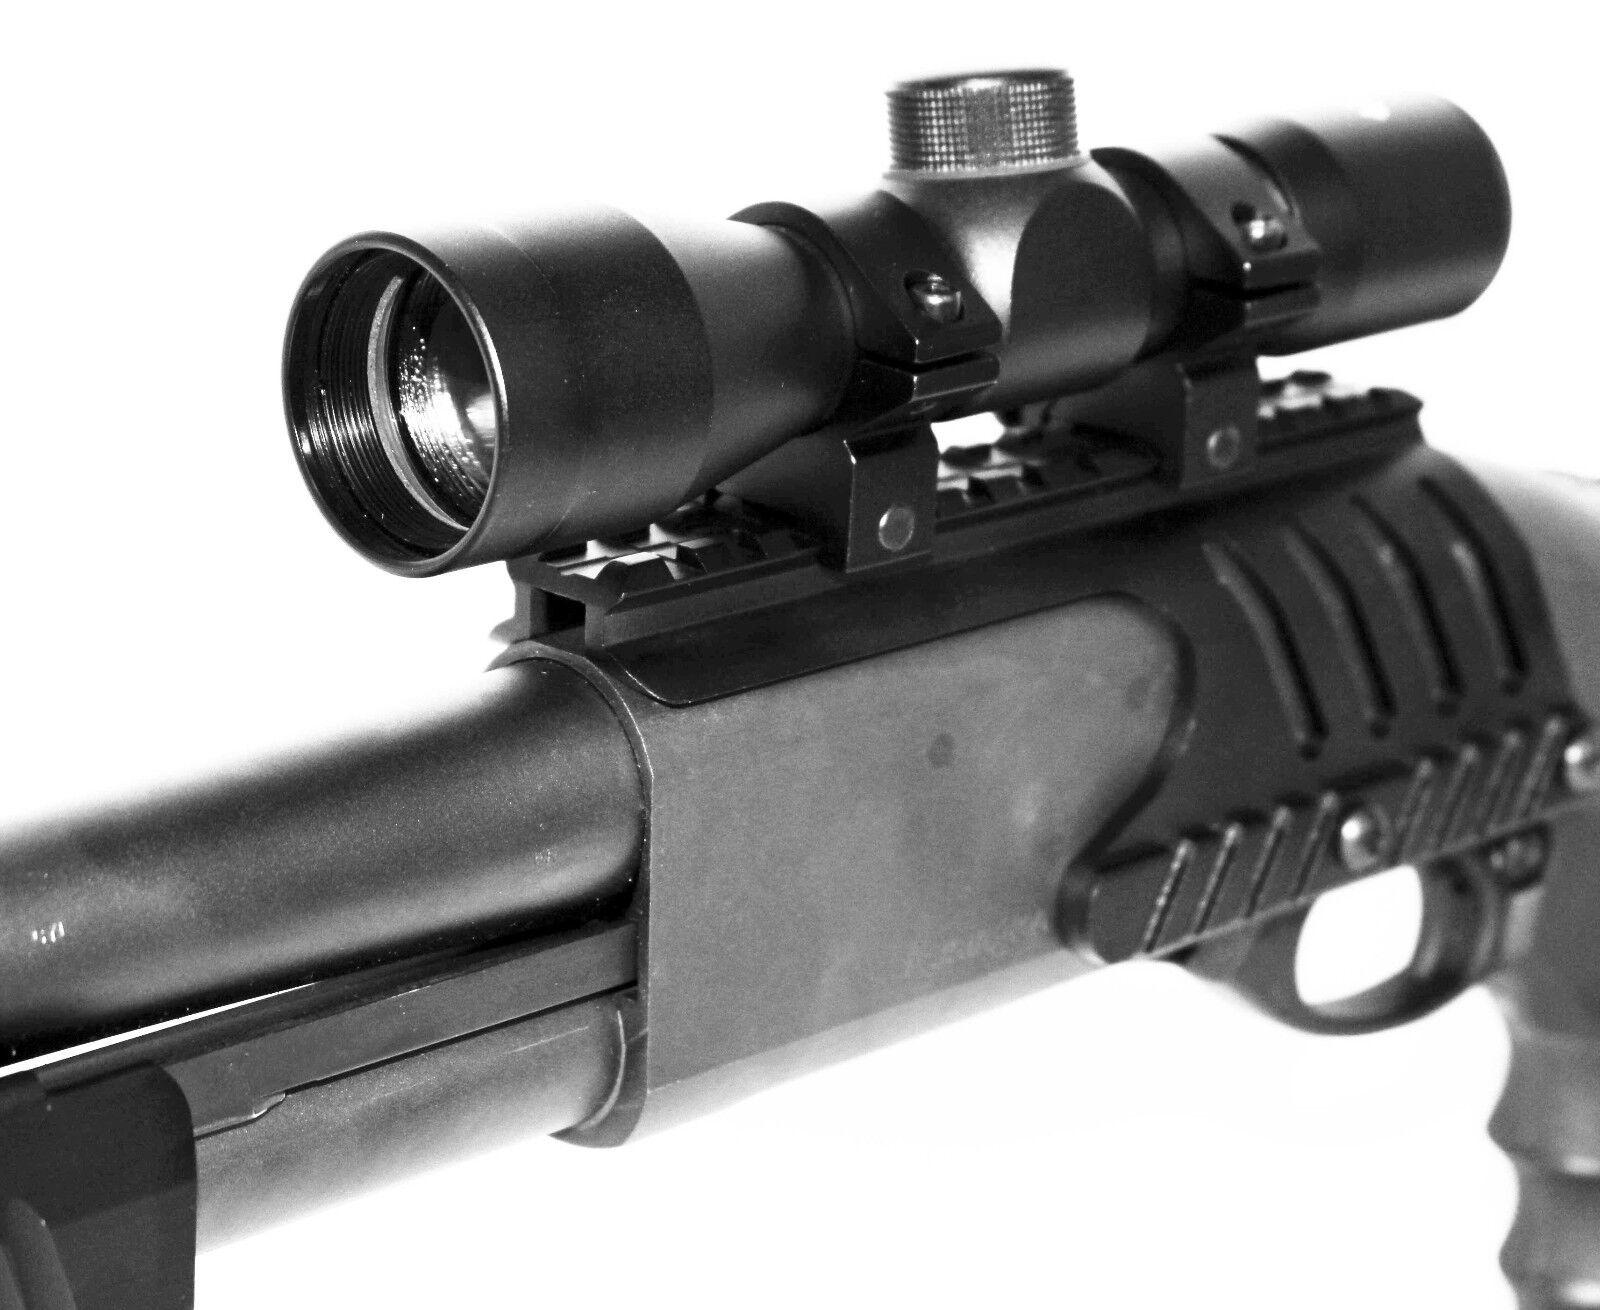 4x32 Scope Kit Remington 870 Tactical Weaver Rail Mount.